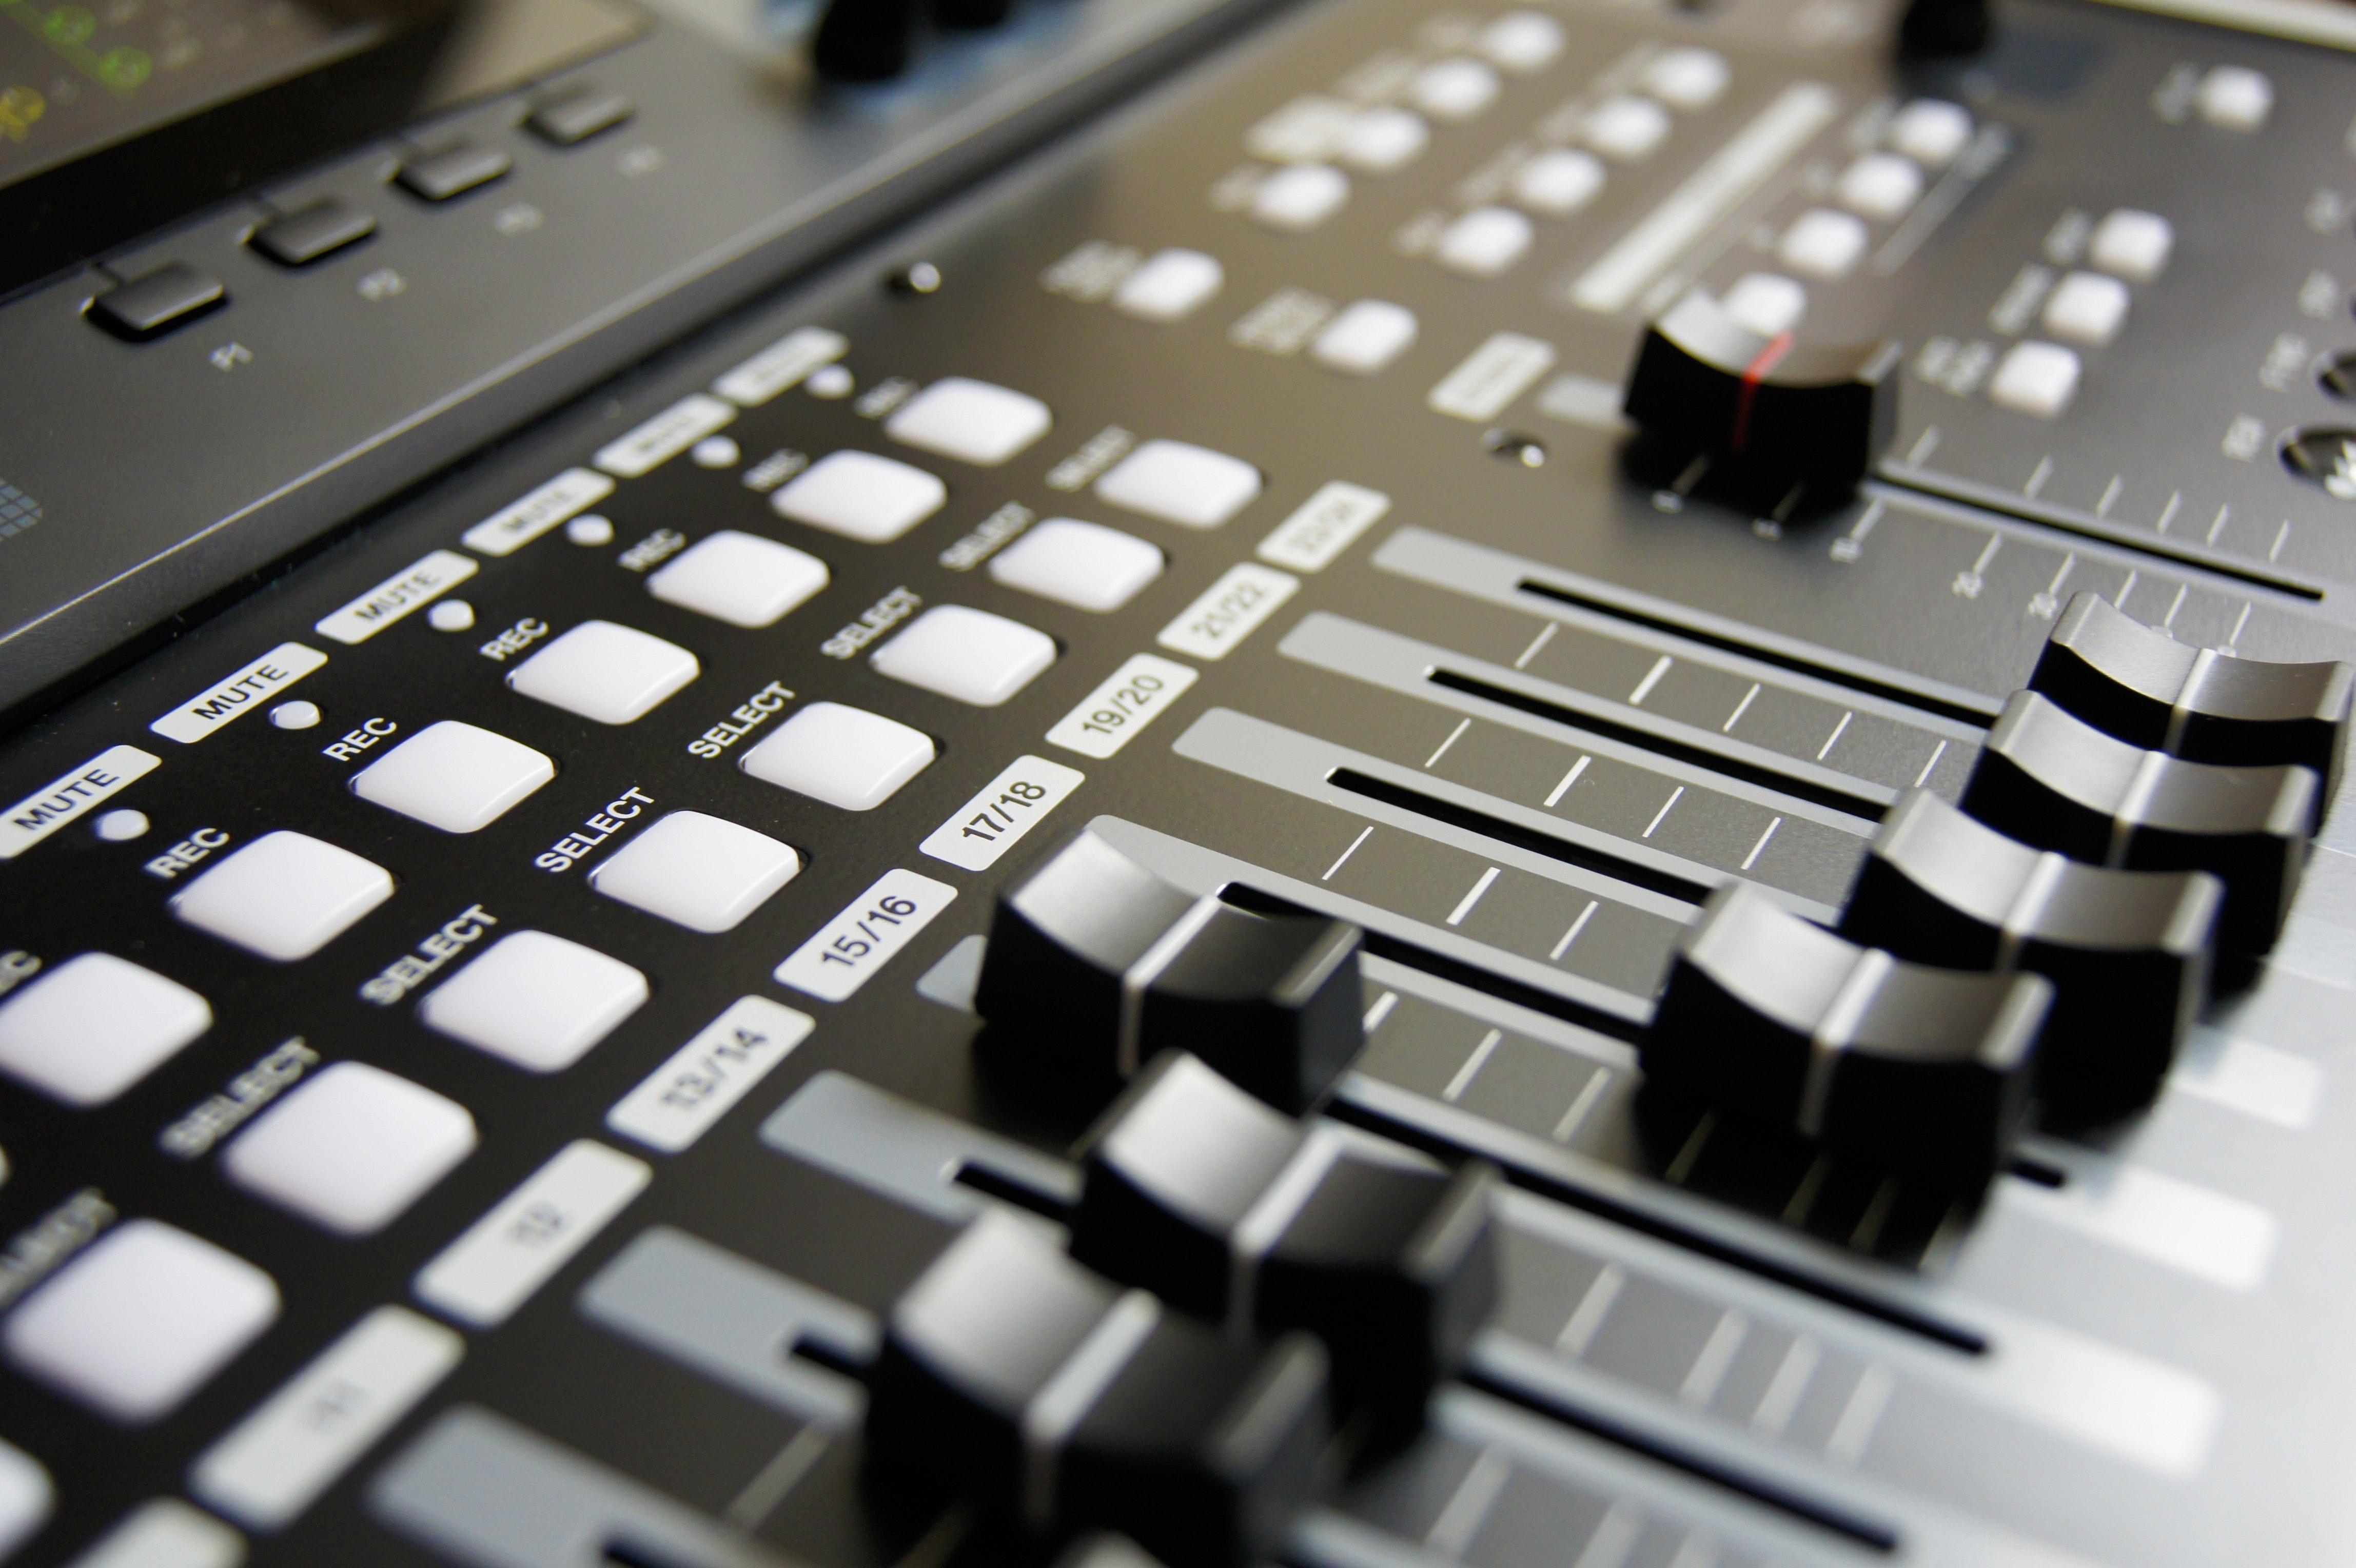 https://images.pexels.com/photos/159206/mixing-table-mixing-music-musician-159206.jpeg?cs=srgb&dl=audio-mixer-buttons-close-up-159206